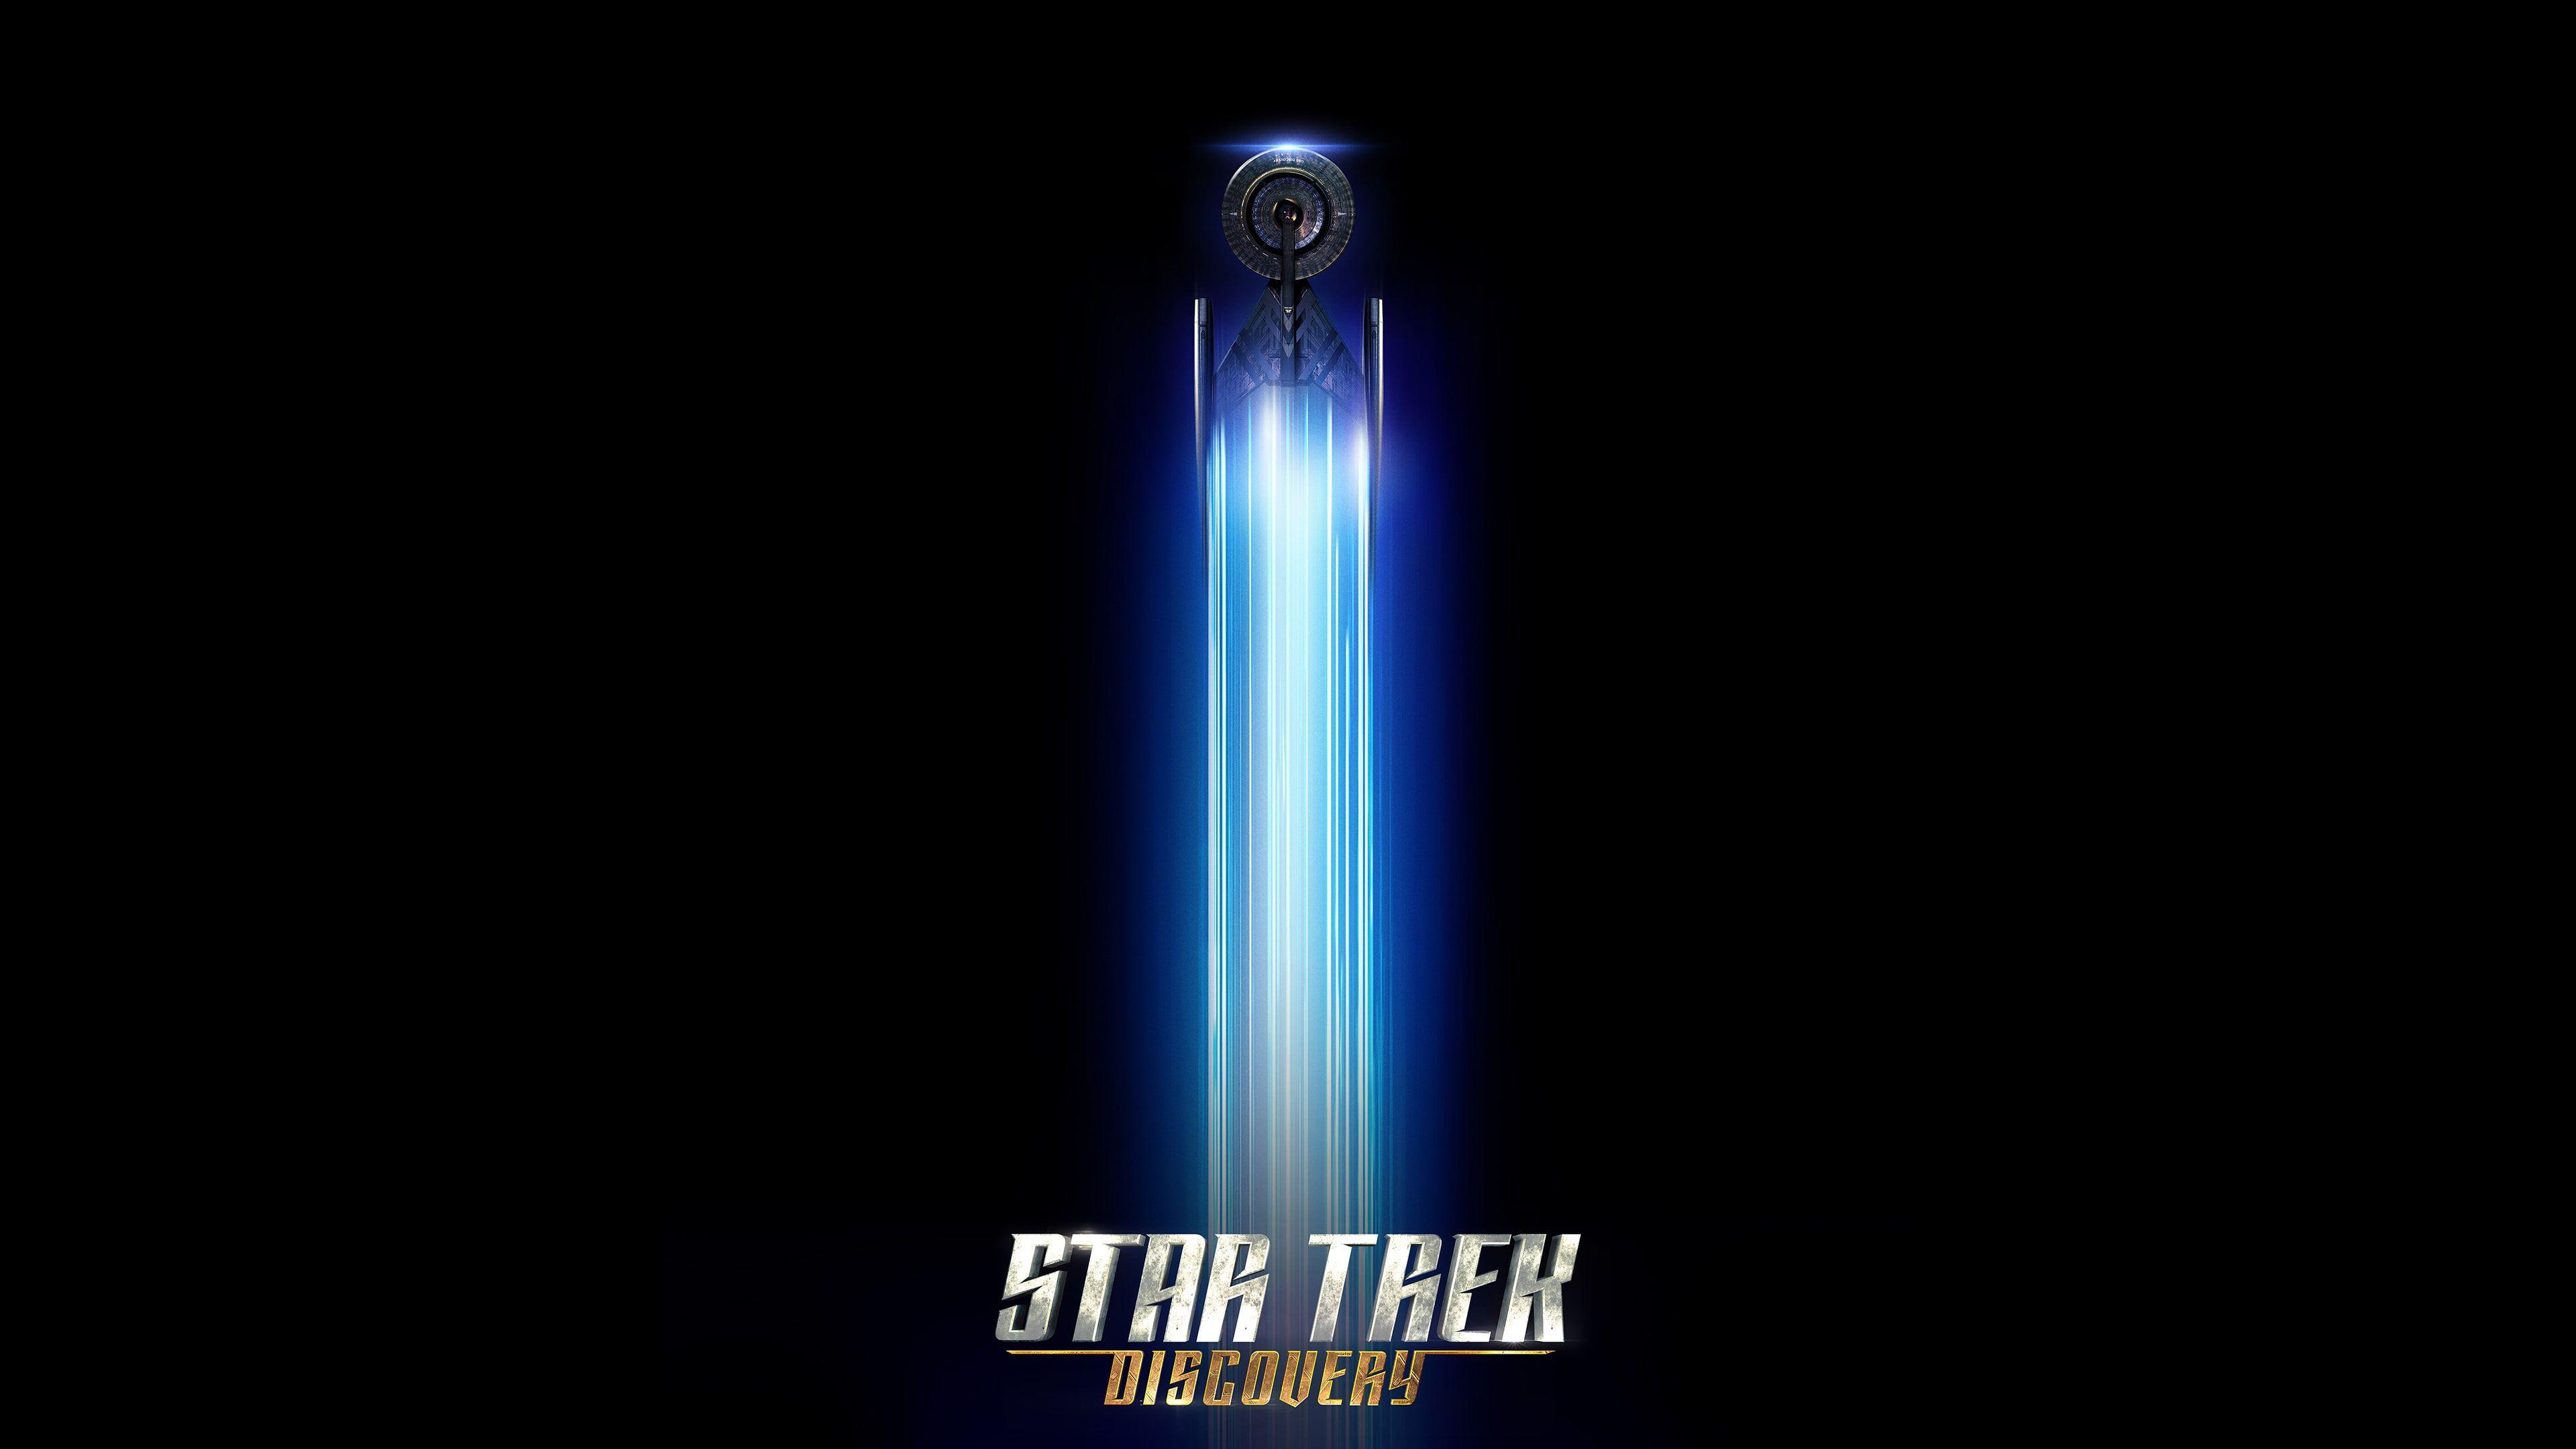 What Will Star Trek Discovery Season 1 Be About Star Trek Wallpaper Star Trek Online